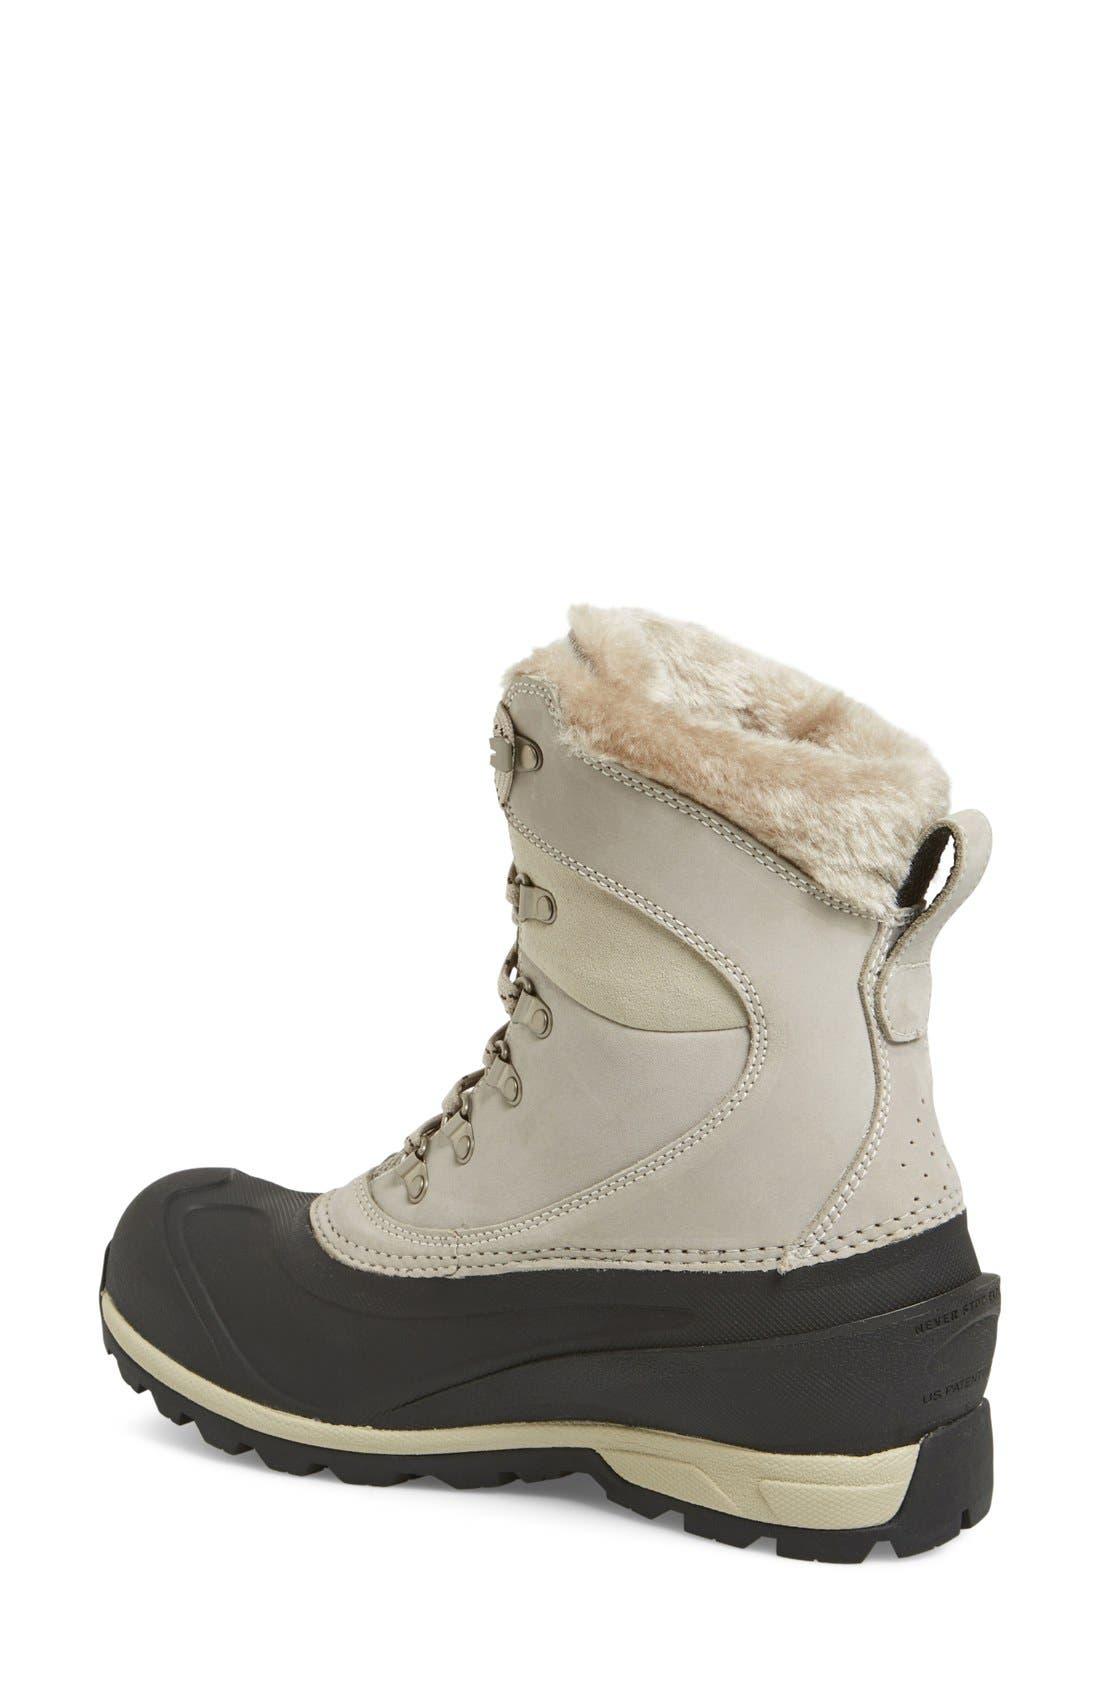 'Chilkat 400' Waterproof PrimaLoft<sup>®</sup> Insulated Boot,                             Alternate thumbnail 13, color,